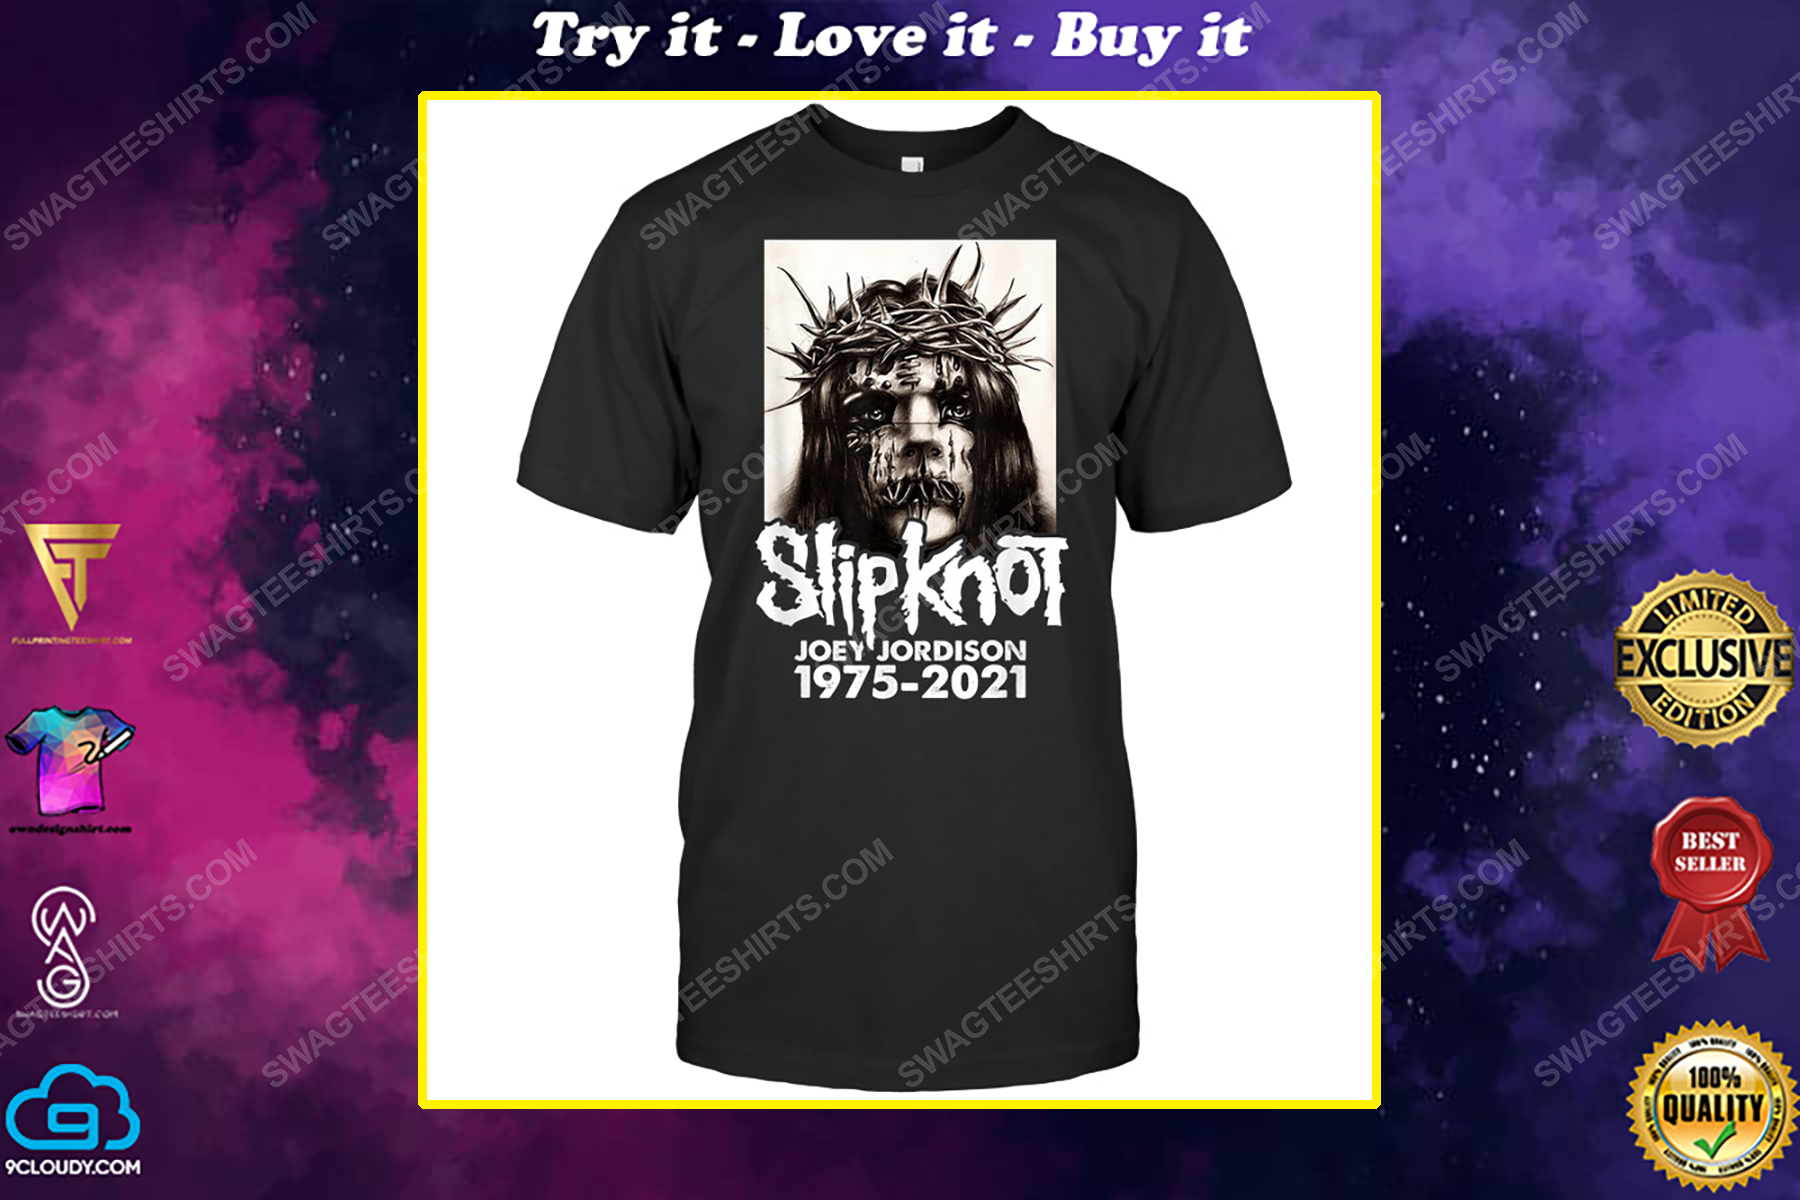 Rock band slipknot joey jordison 1975 2021 shirt